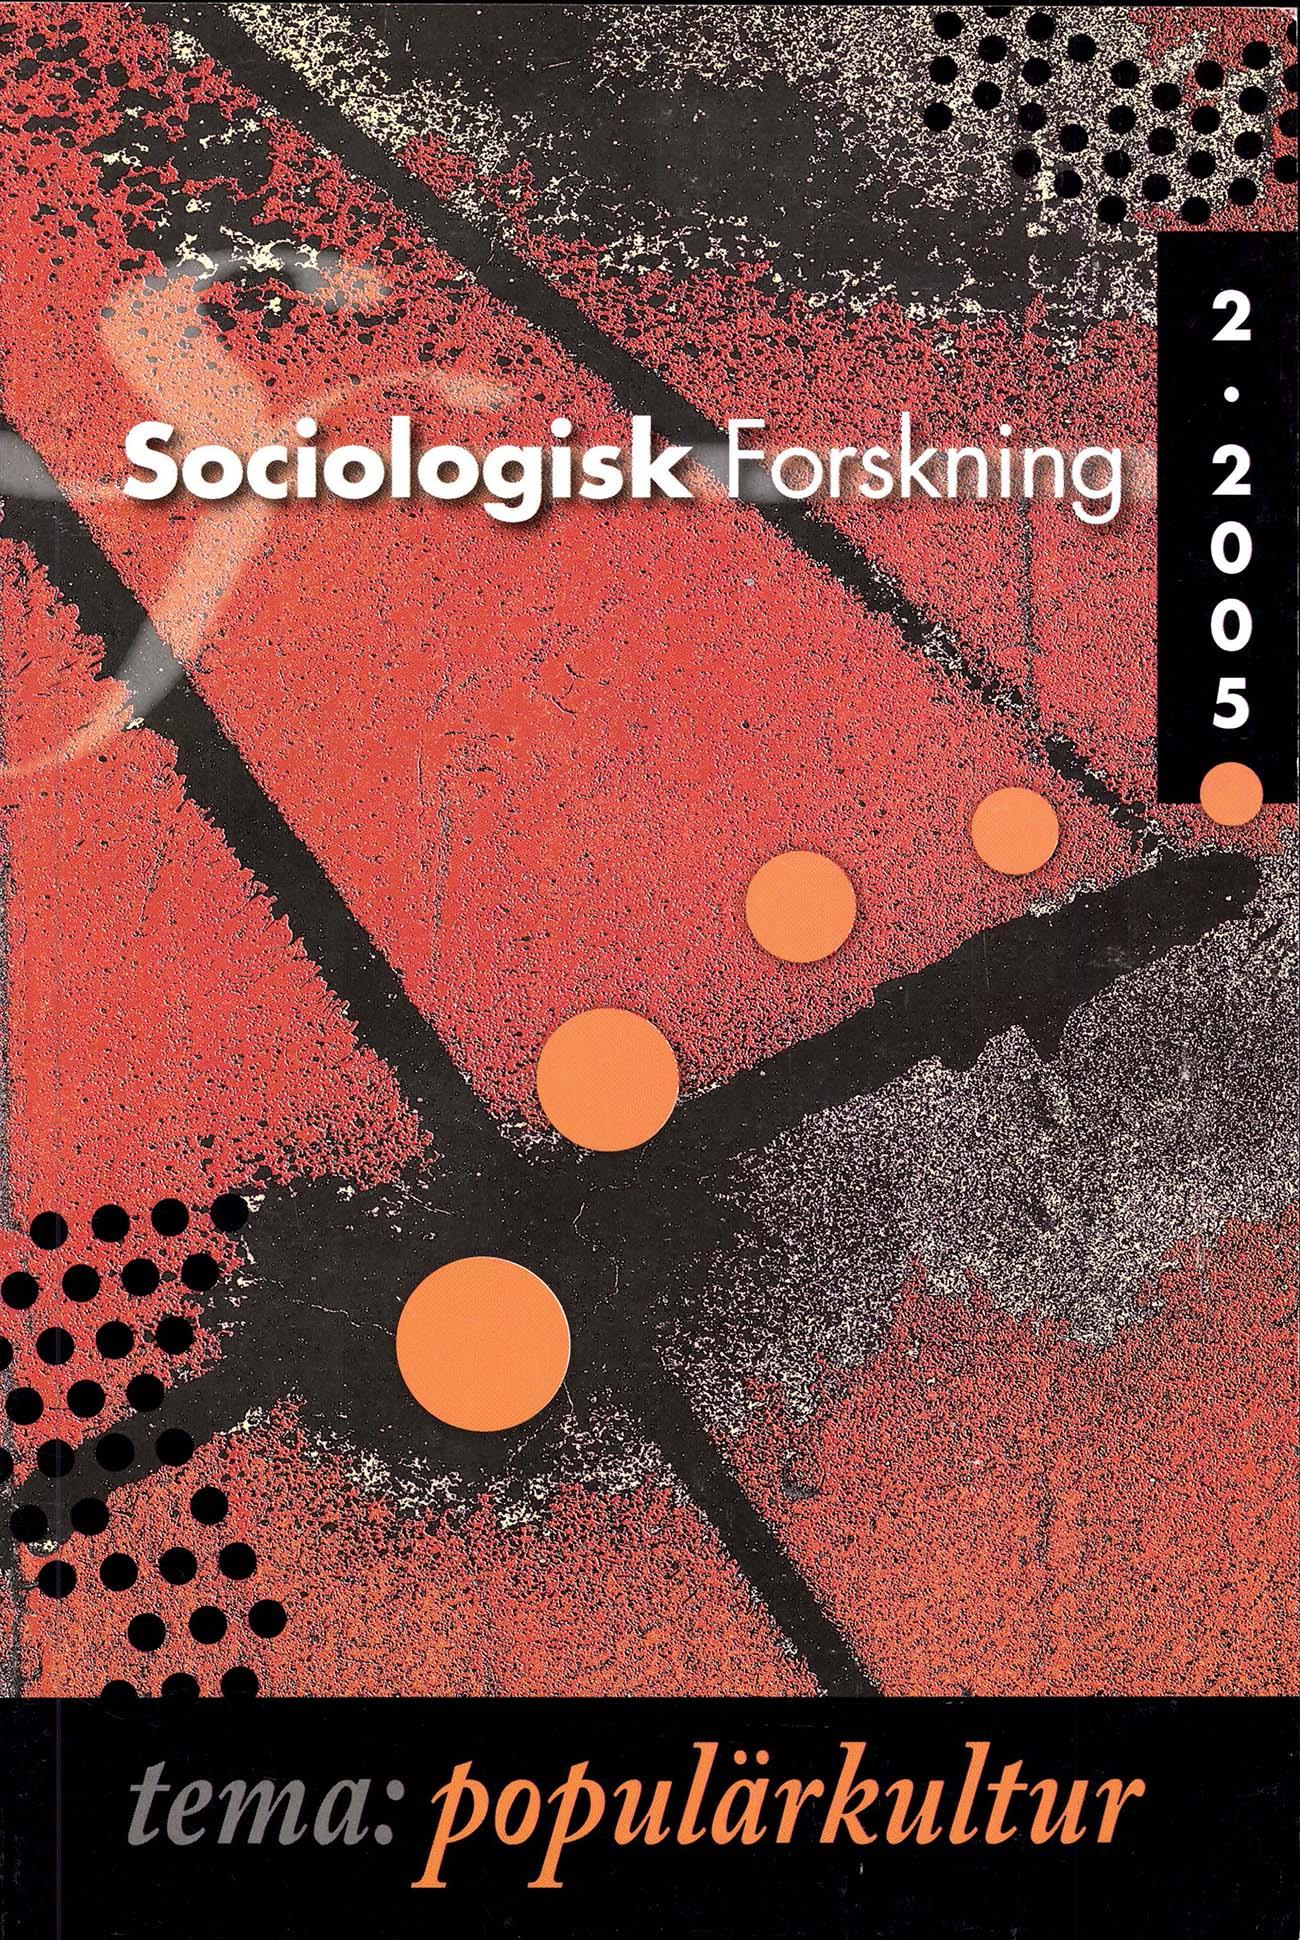 Visa Vol 42 Nr 2 (2005): Tema: Populärkultur